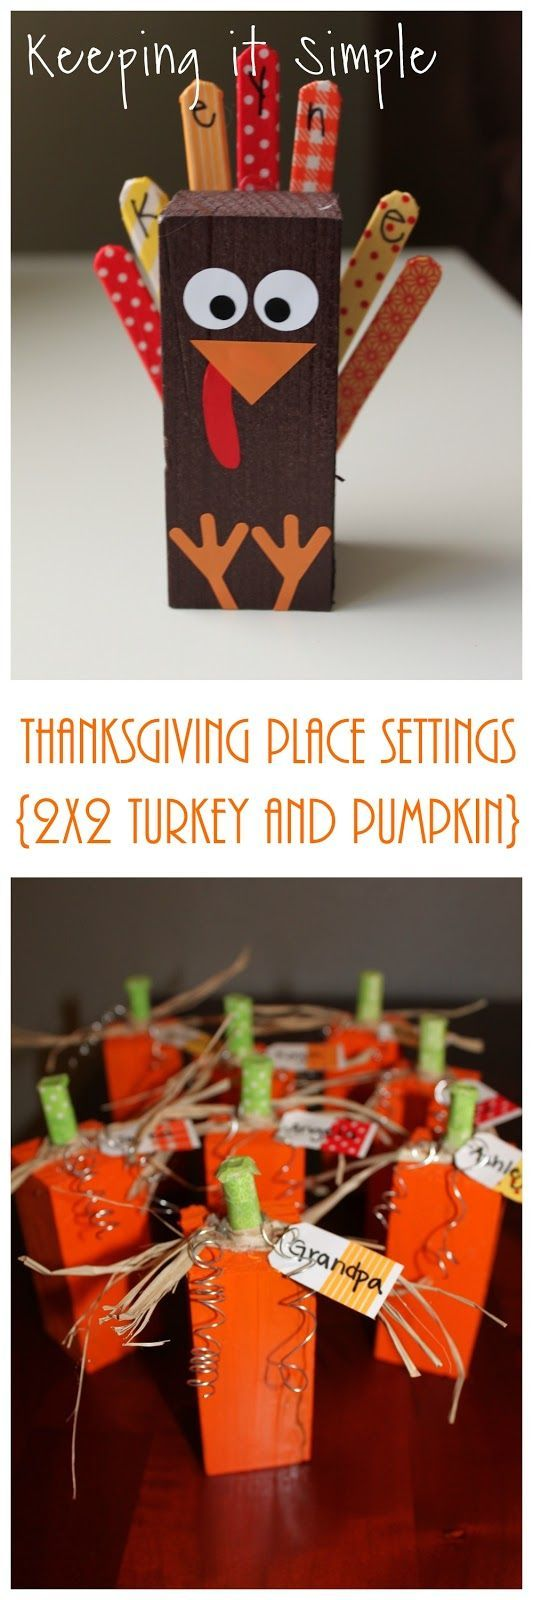 Thanksgiving Place Setting Ideas- 2x2 Wood Turkey and Pumpkin